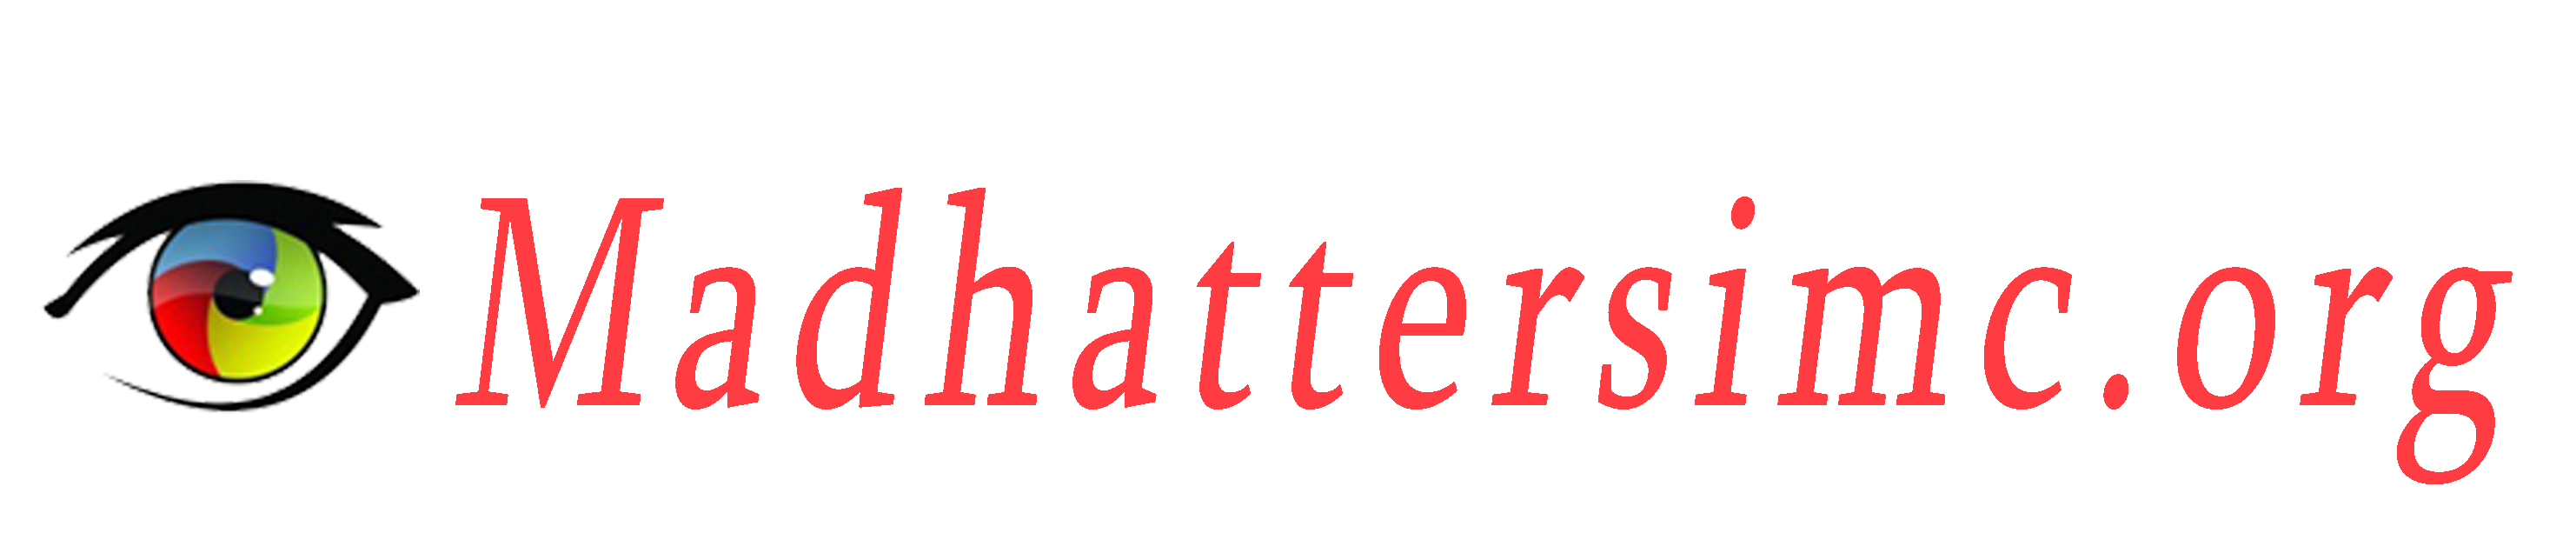 madhattersimc.org